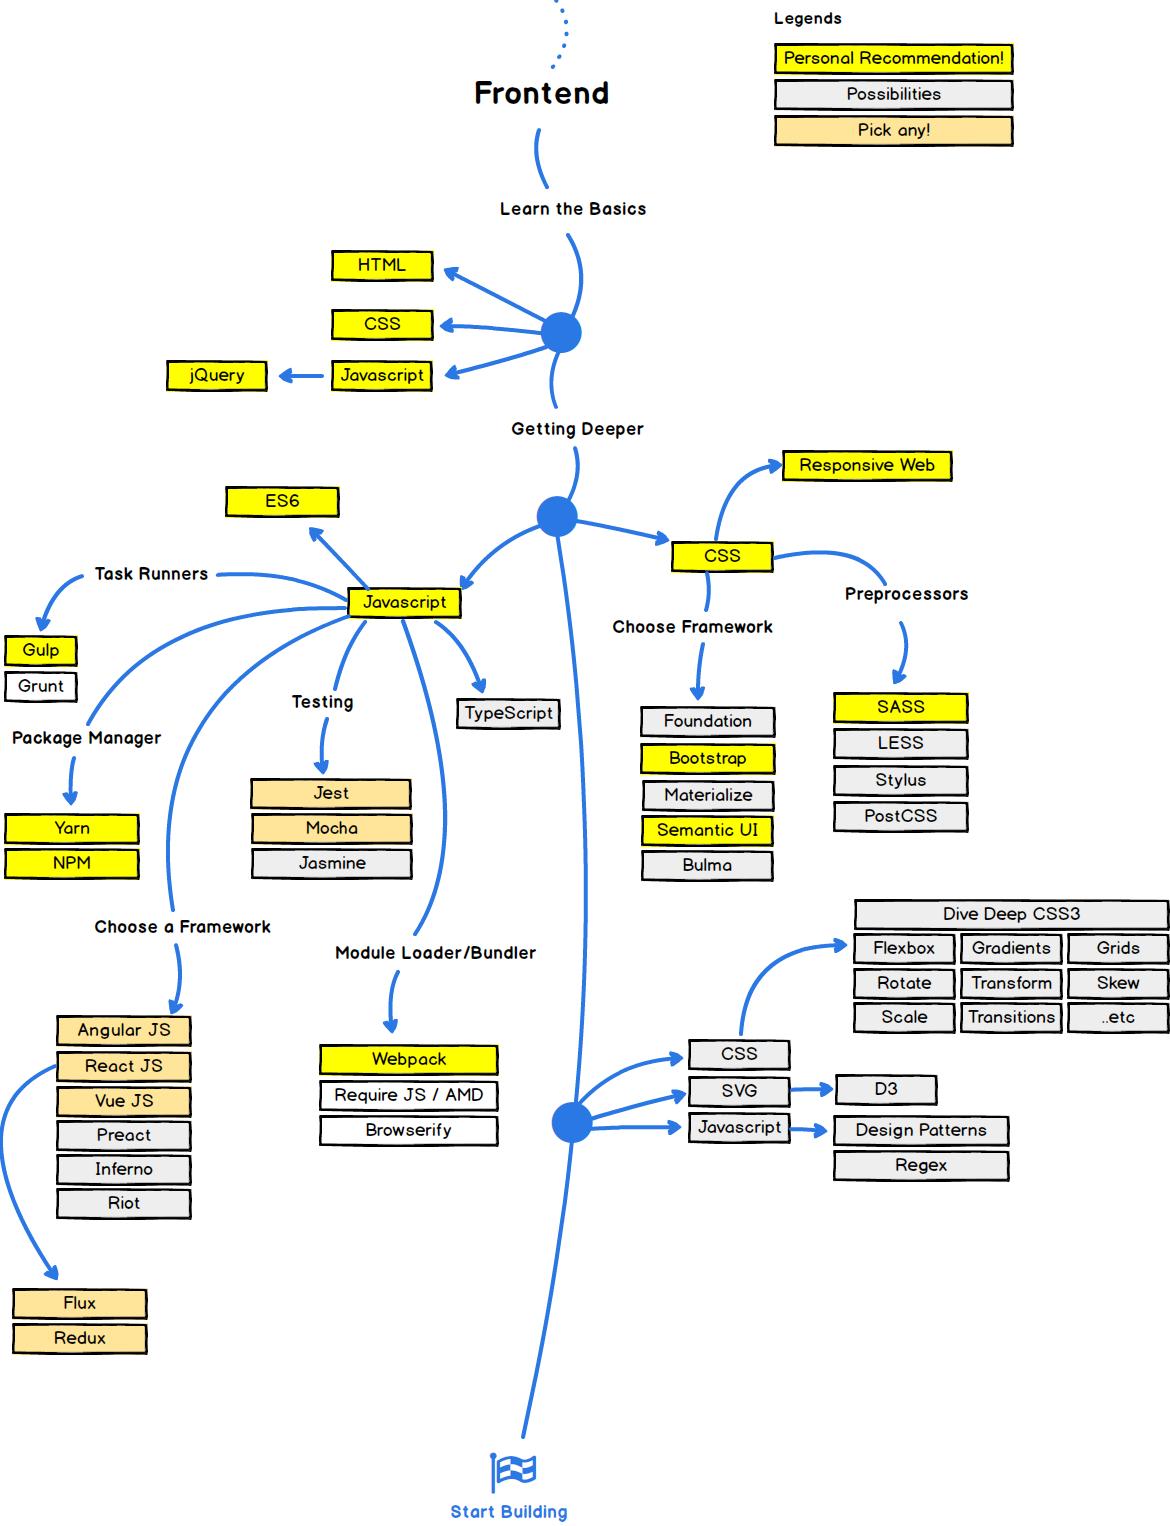 GitHub - kamranahmedse/developer-roadmap: Roadmap to becoming a web